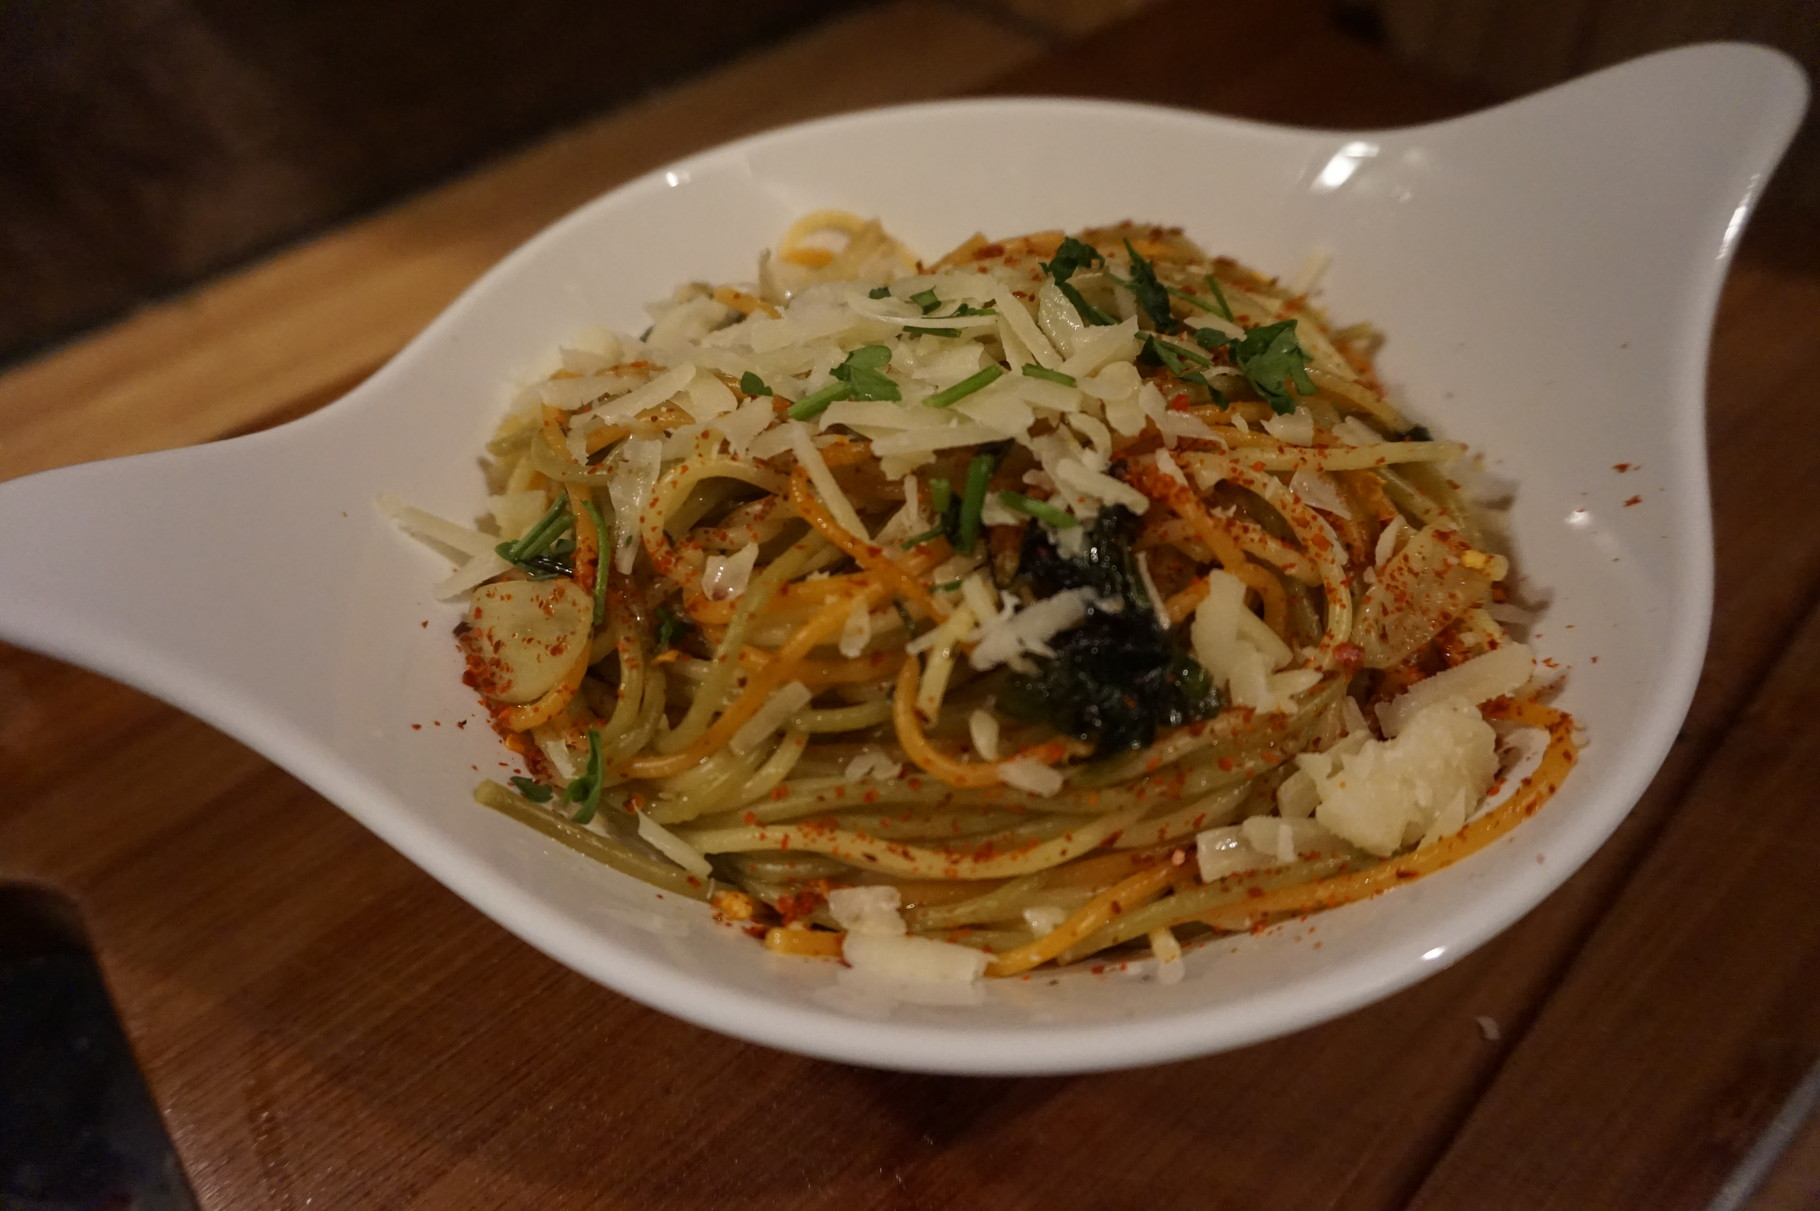 rezept spaghetti aglio e olio a la jamie oliver tuerkische rezepte foodblog. Black Bedroom Furniture Sets. Home Design Ideas